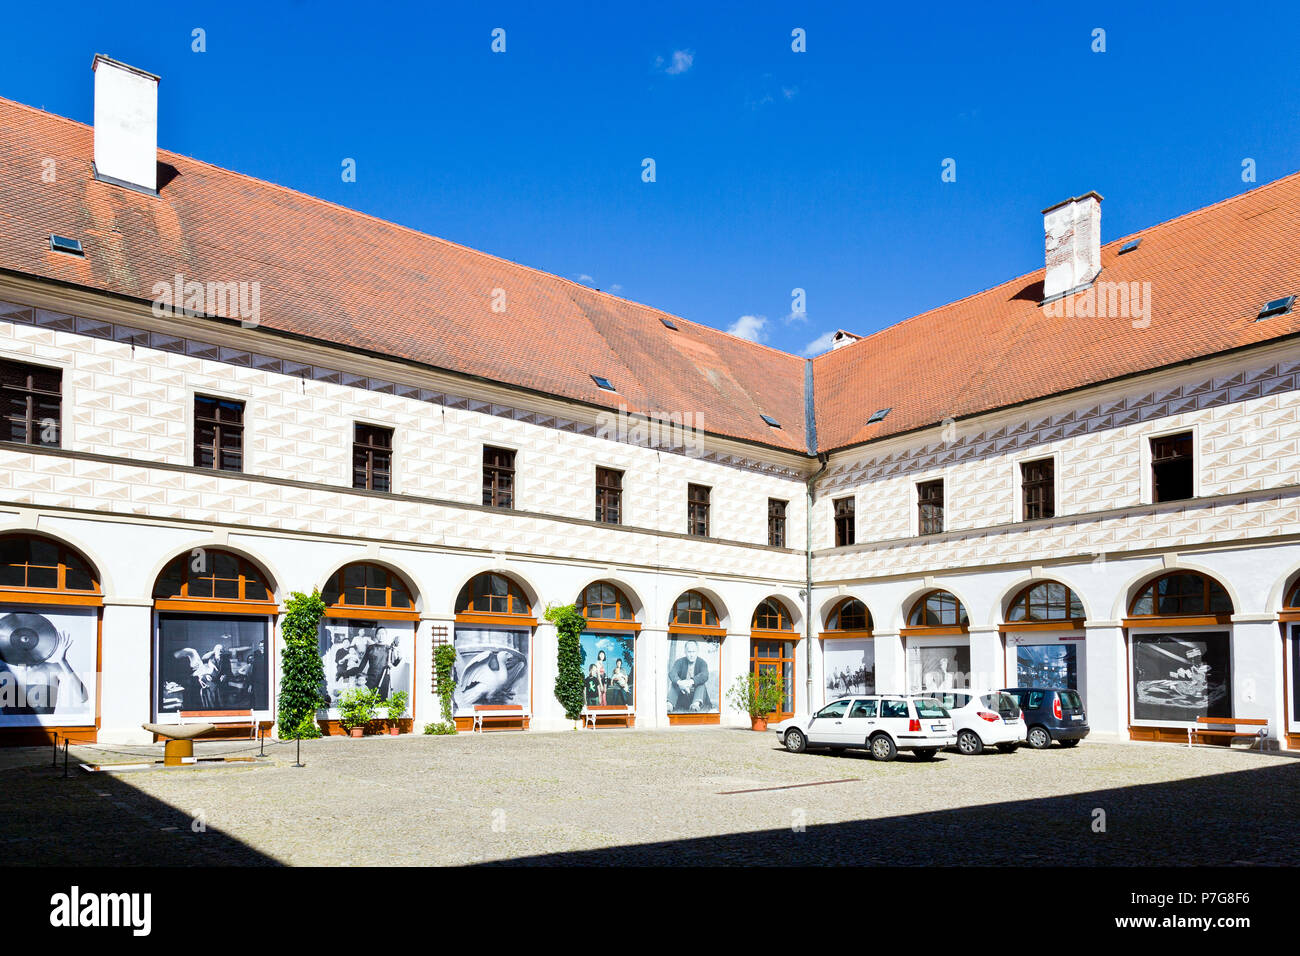 Muzeum Fotografie eine moderních obrazových médií, Trutnov, Jizni Cechy, Ceska Republika / Museum für Fotografie und modernen visuellen Medien, Jindr Stockbild